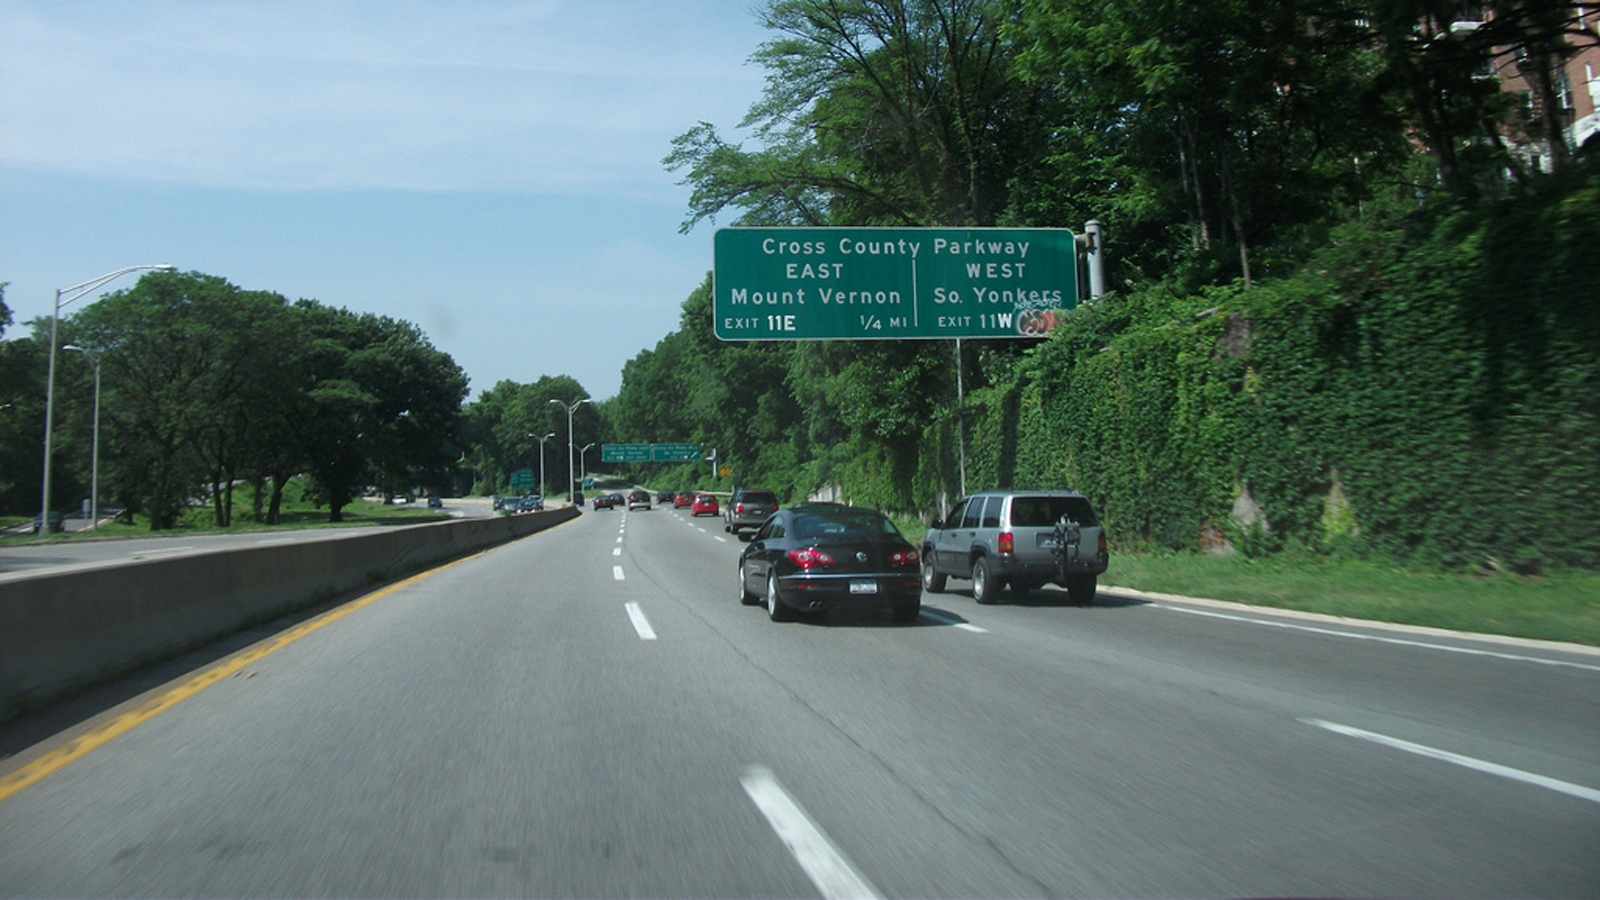 NYC_BronxRiverParkway_signature_DougKerr_2011_01.jpg